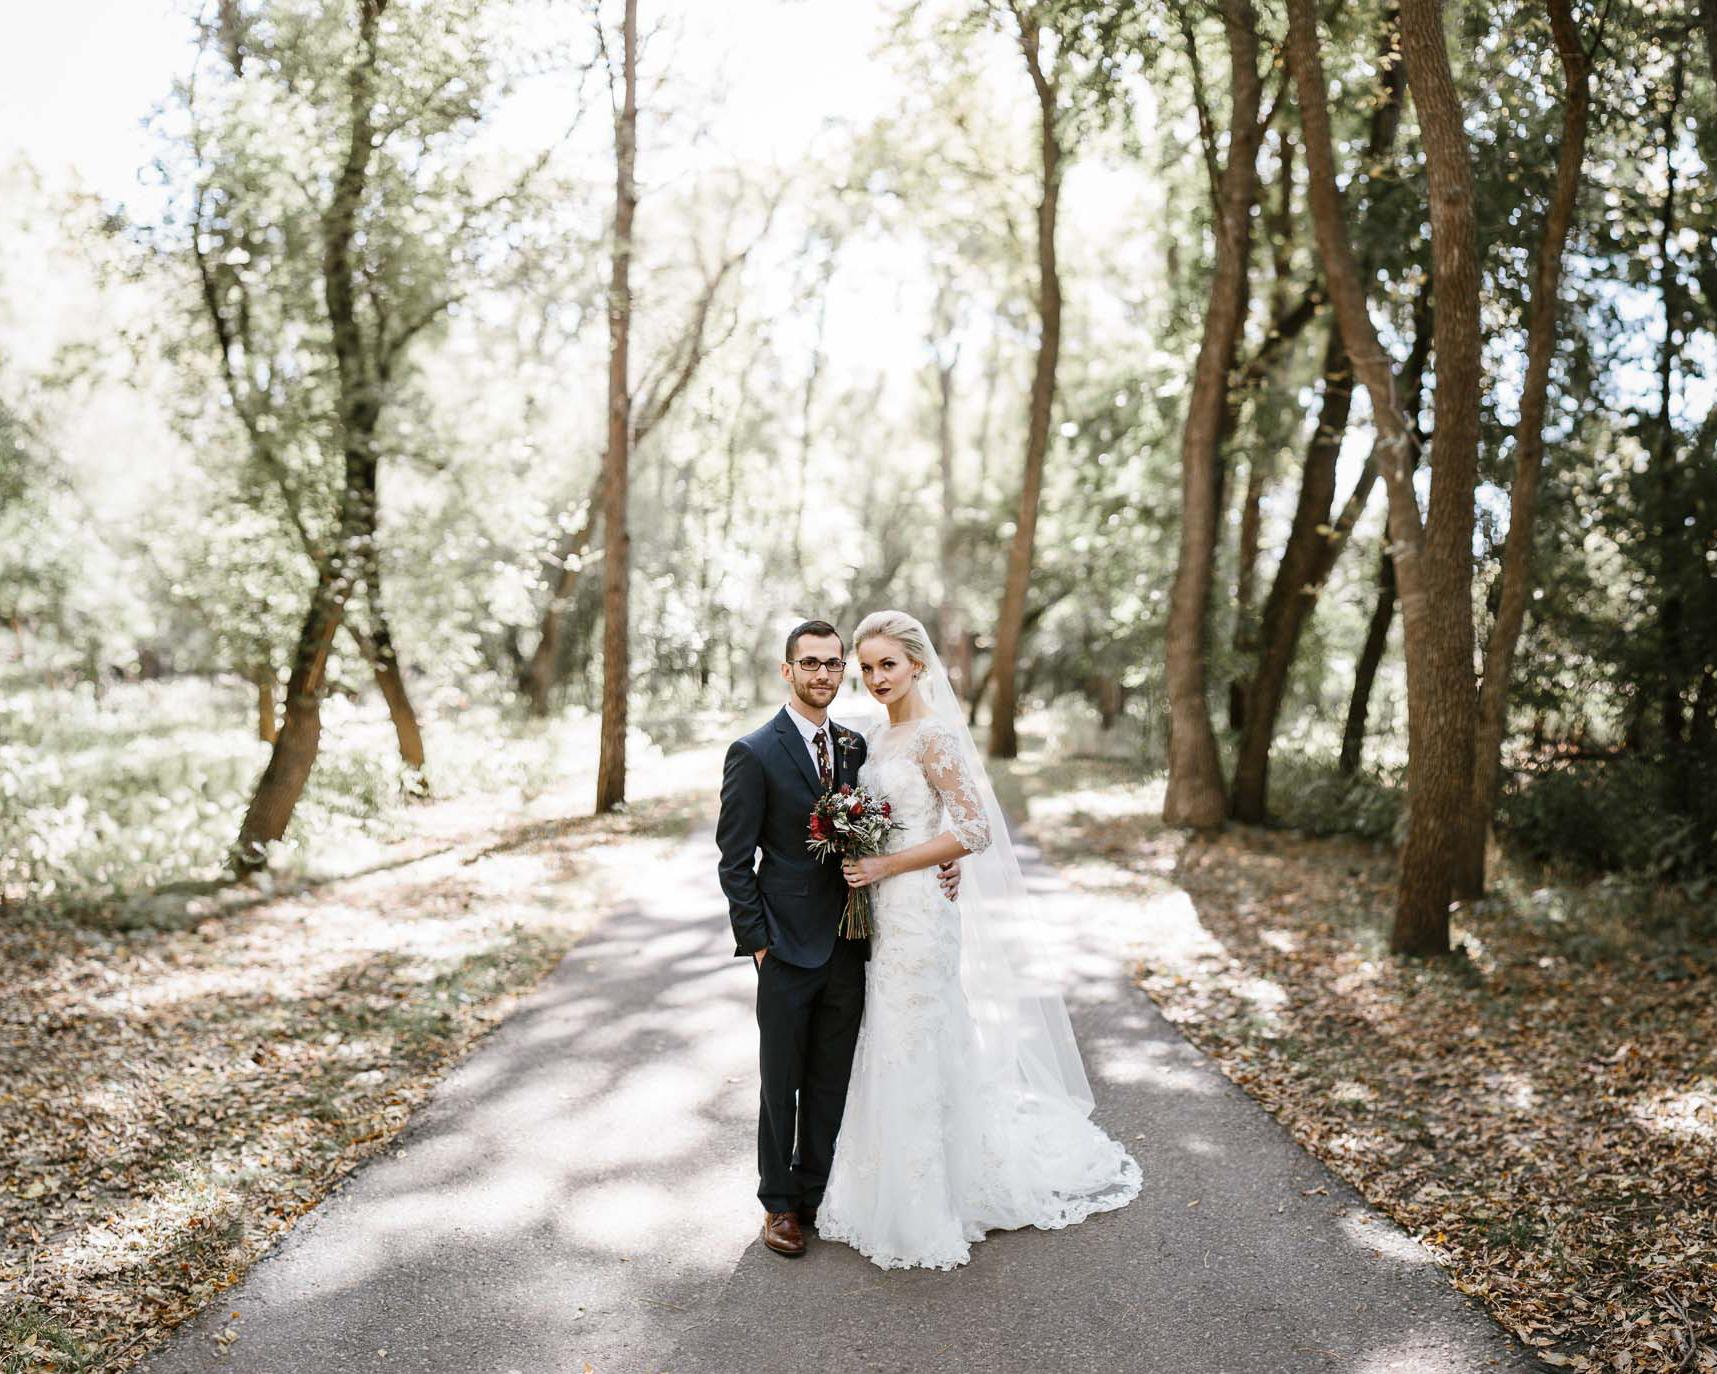 Jenna&Austin_SiouxFalls_Wedding_Photographer_049.jpg